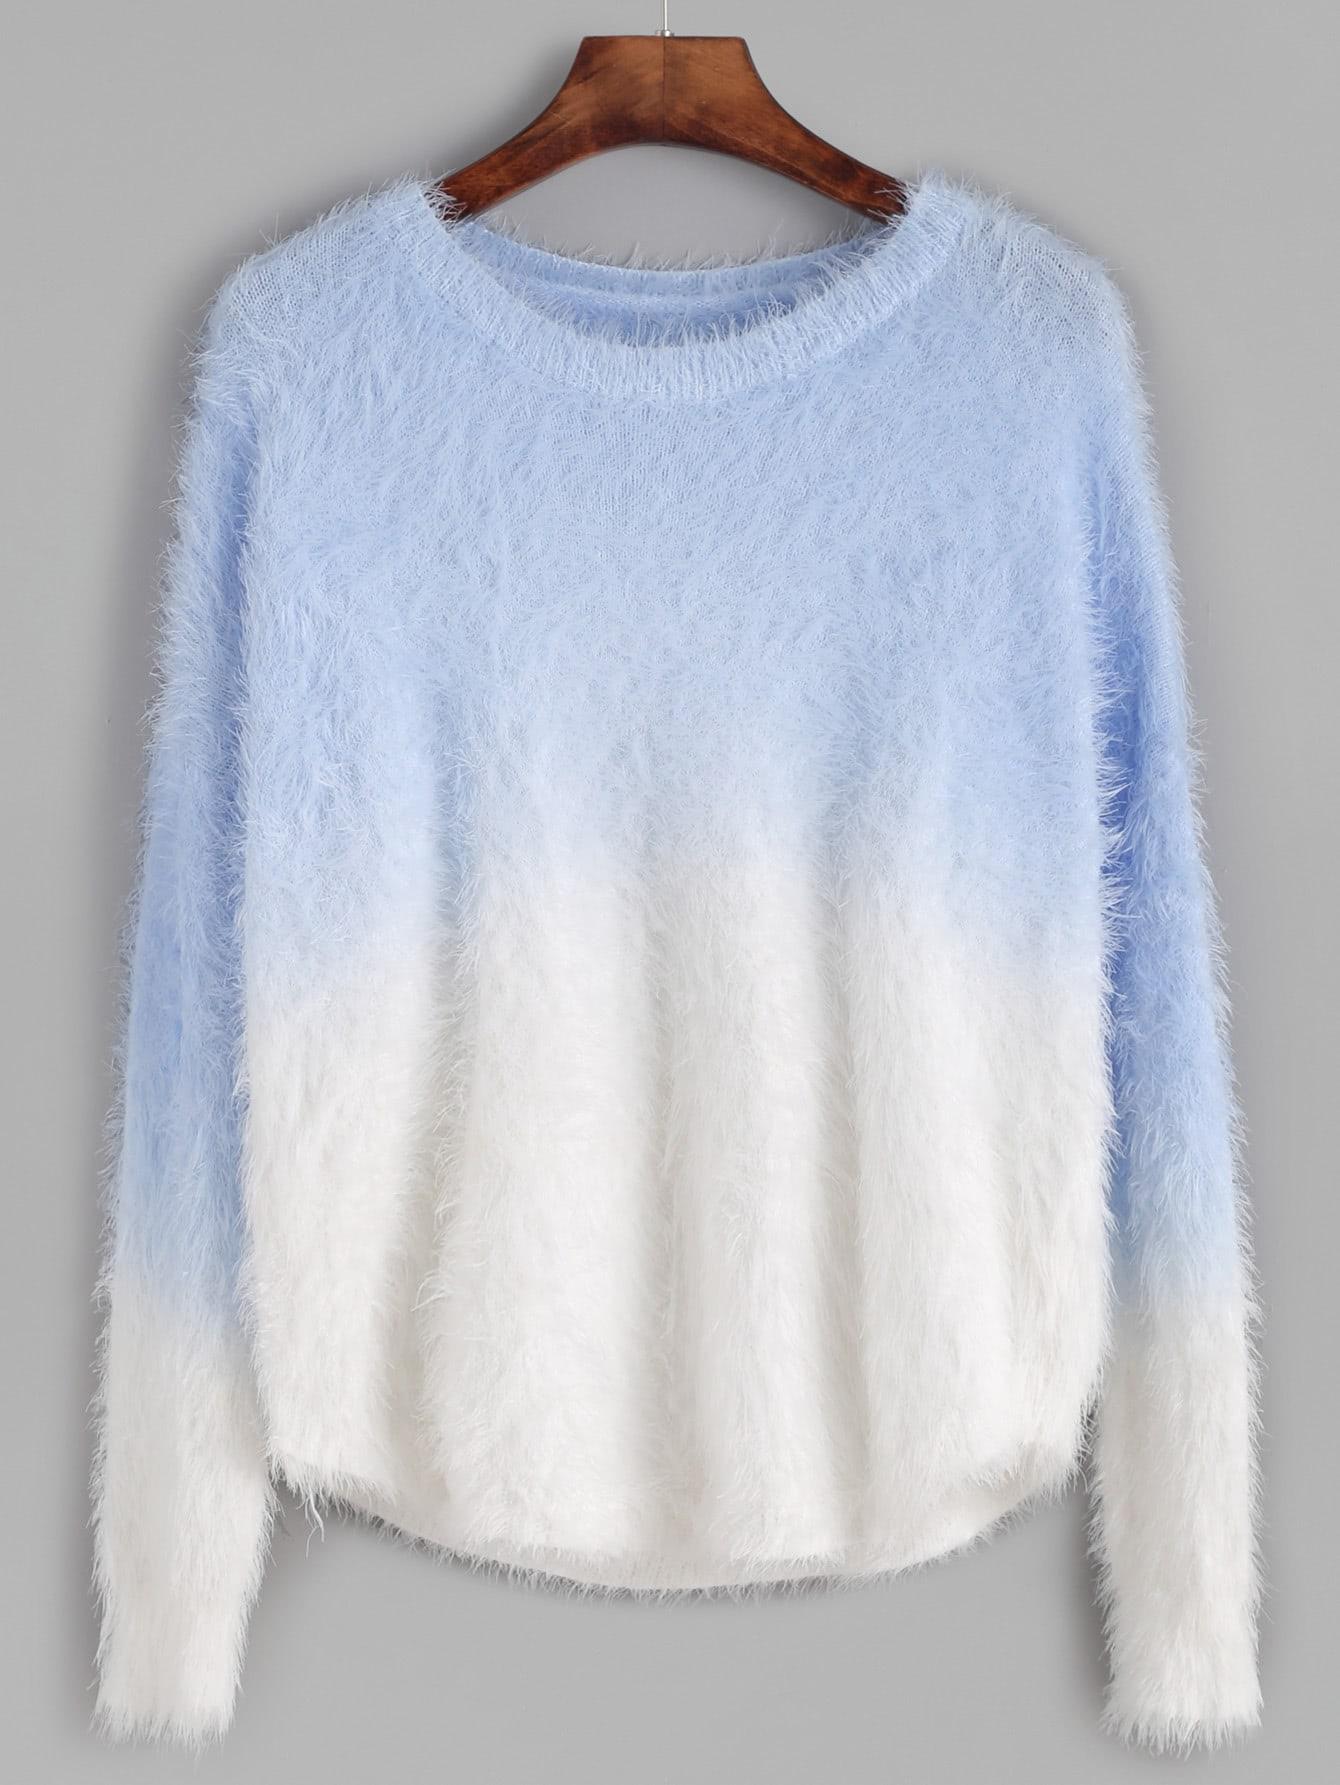 sweater161017301_2